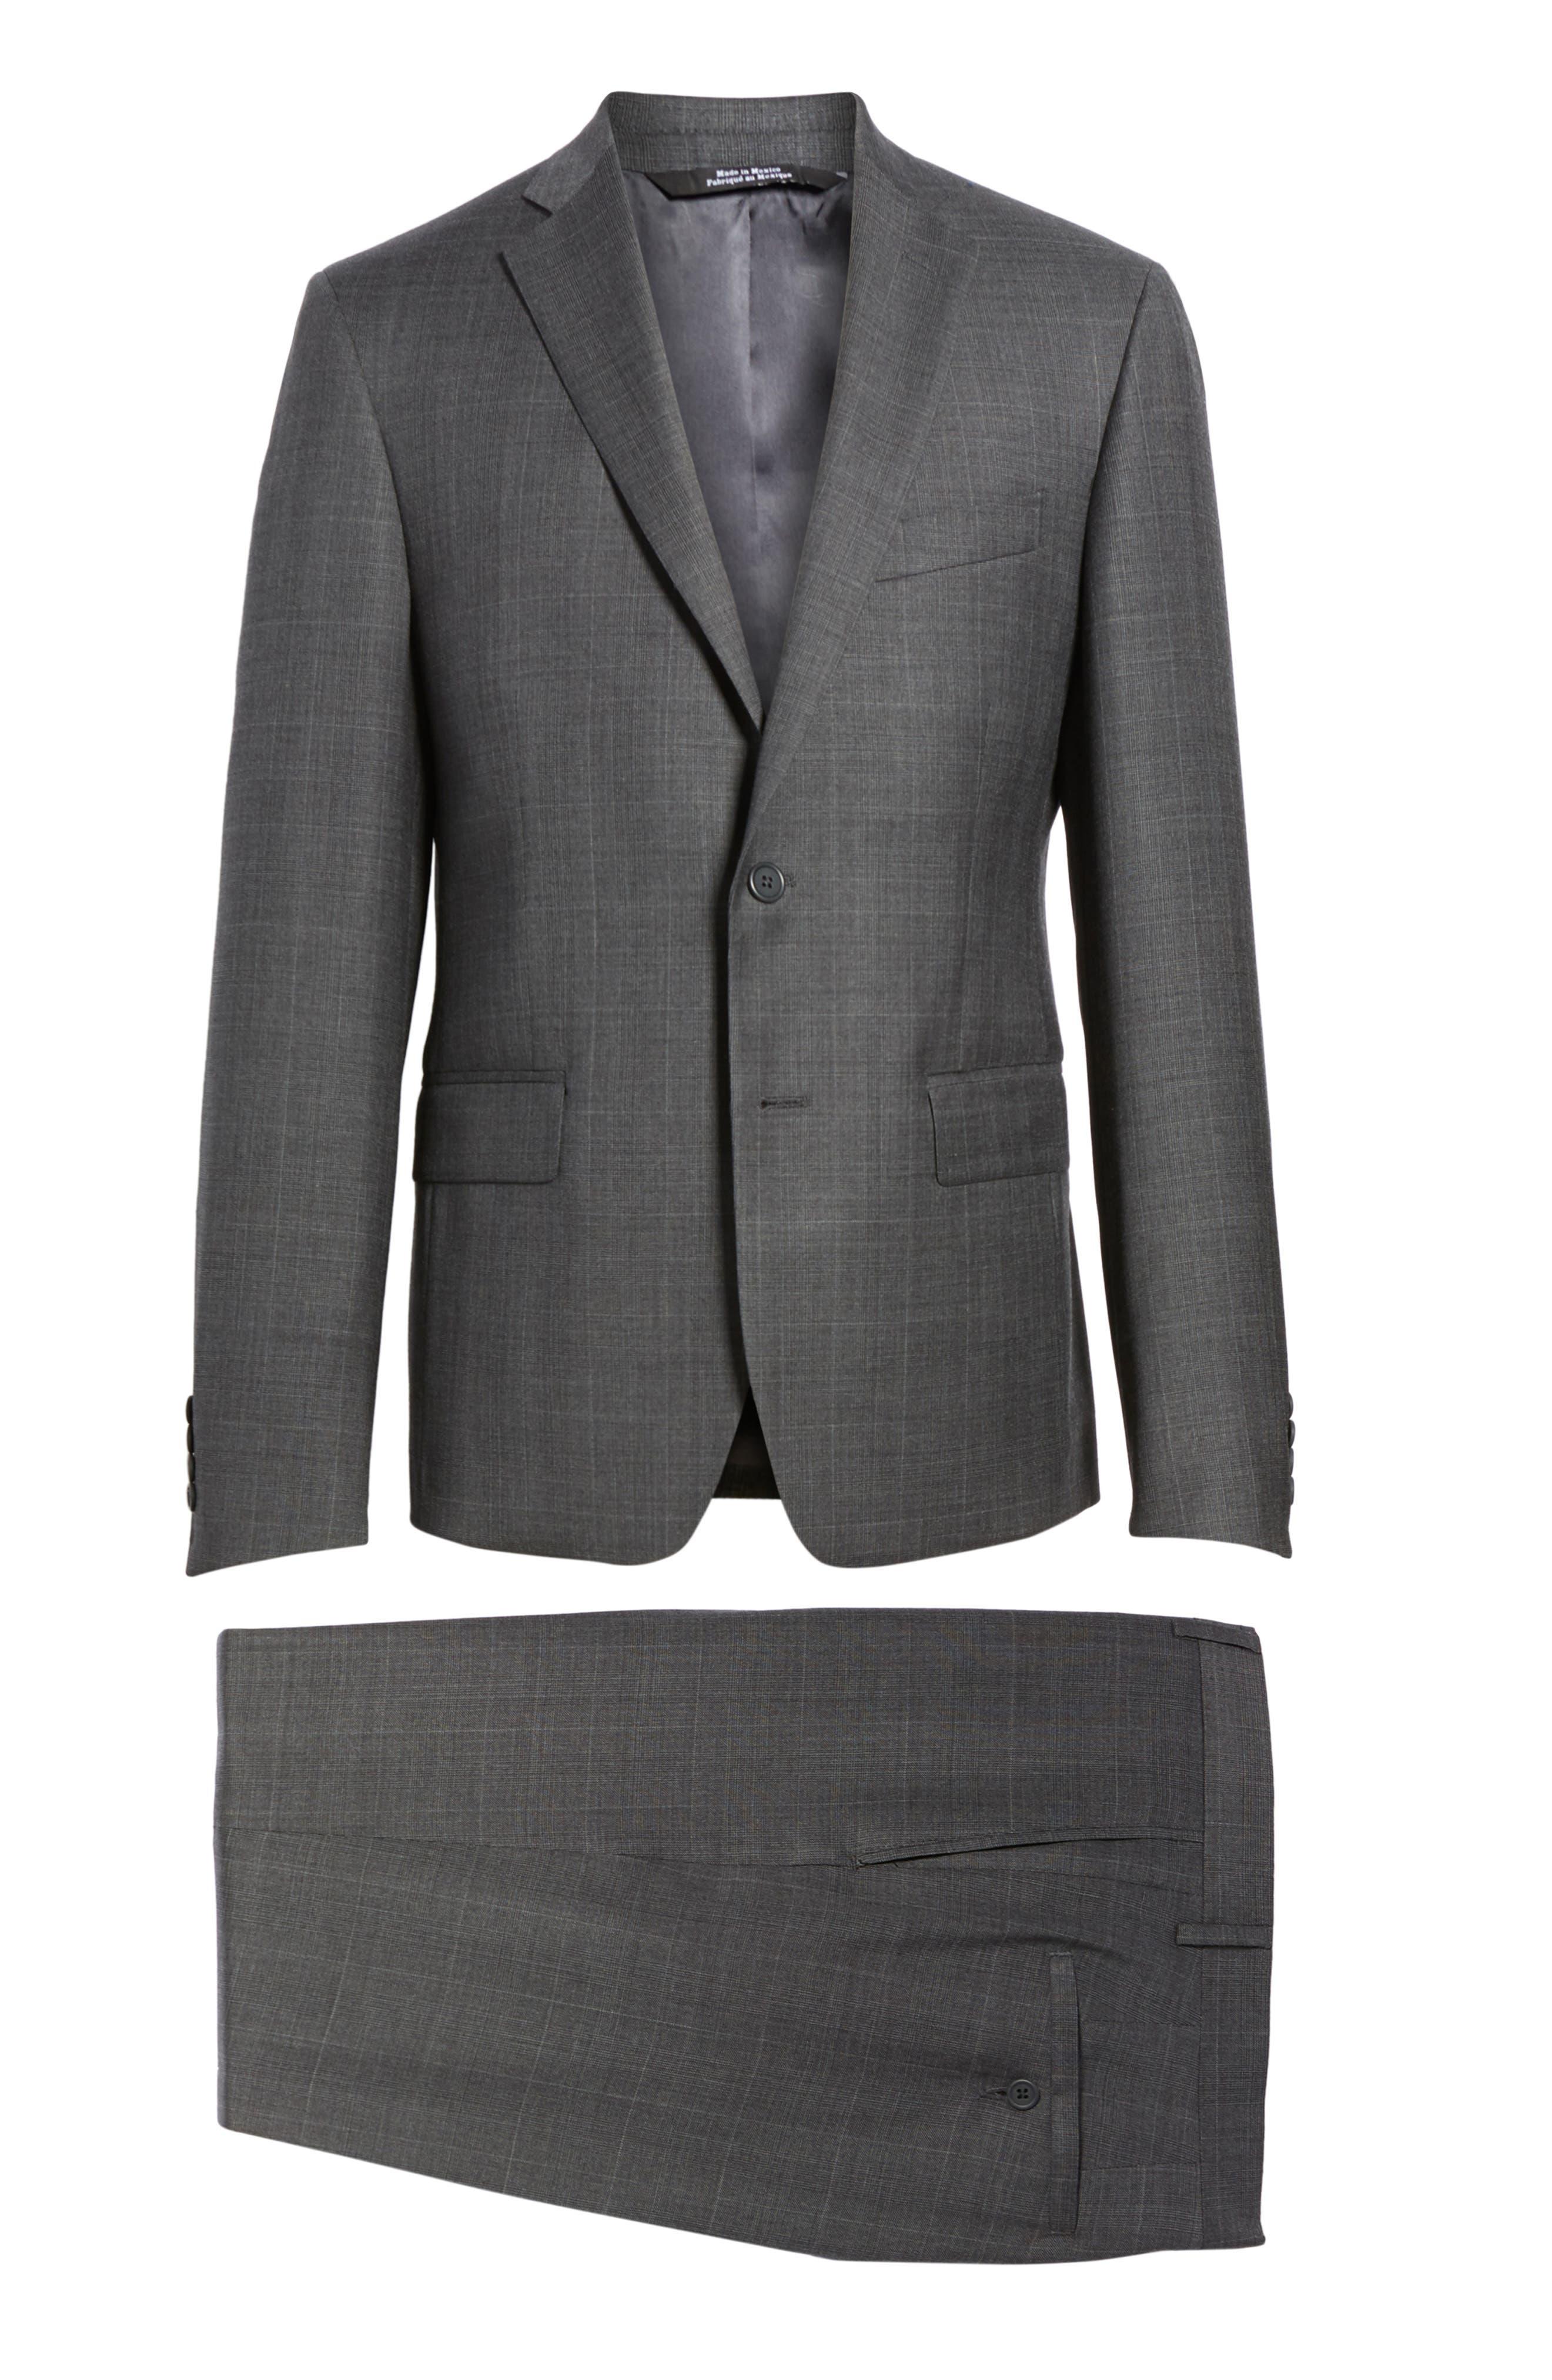 Extra Trim Fit Plaid Wool Suit,                             Alternate thumbnail 8, color,                             Grey